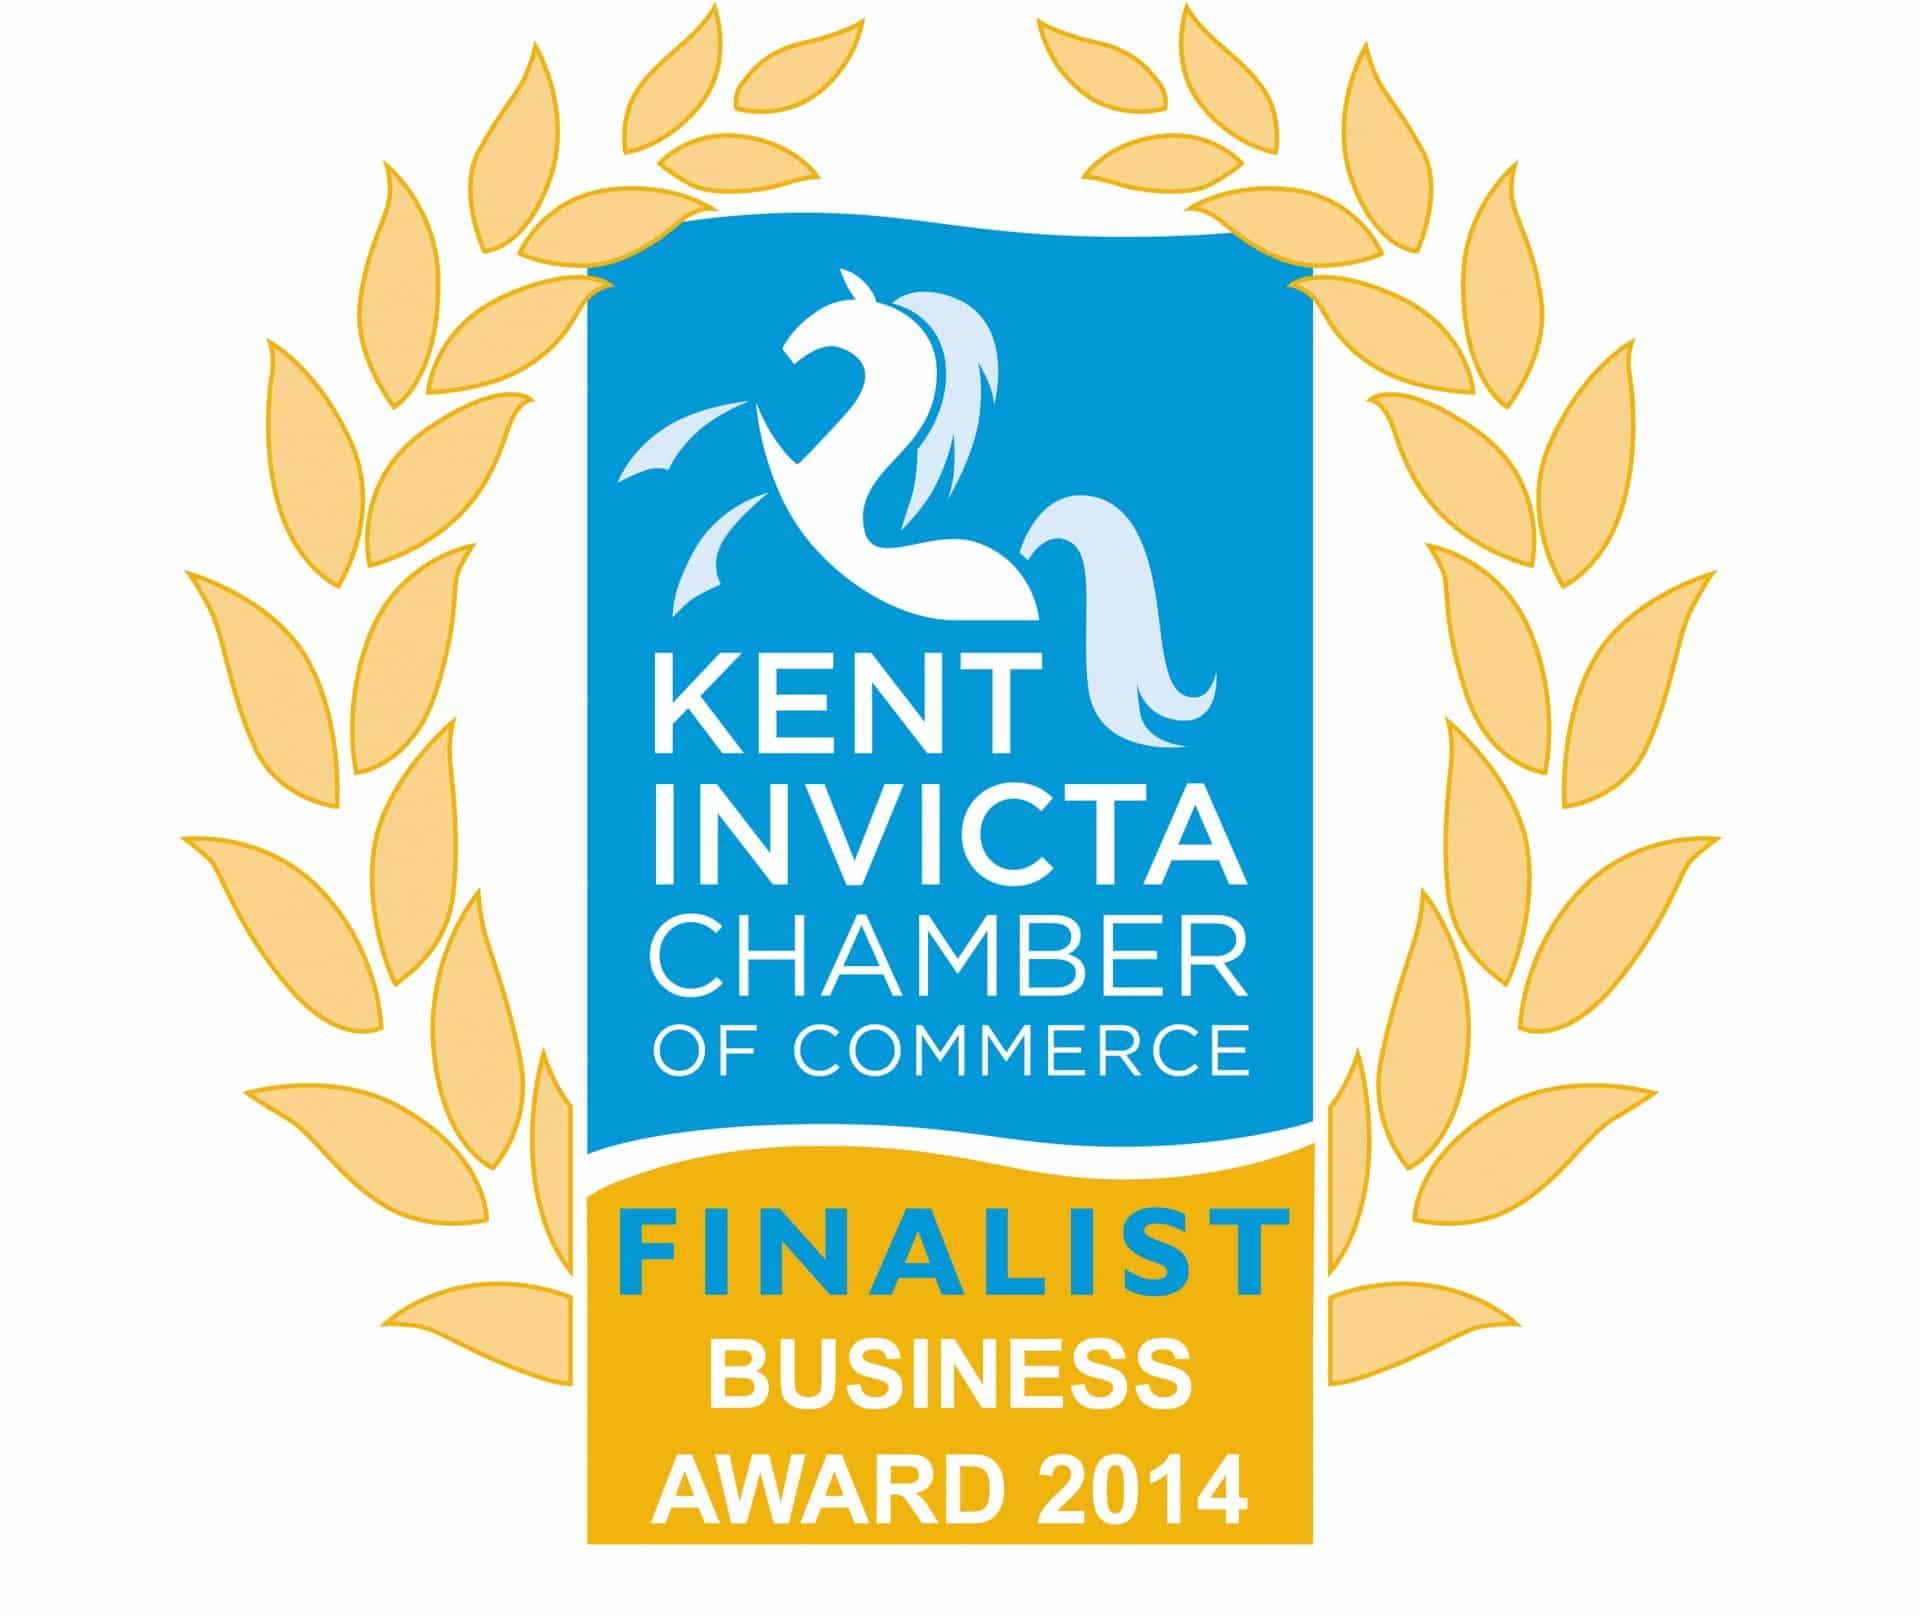 Kent Invicta Chamber Finalist